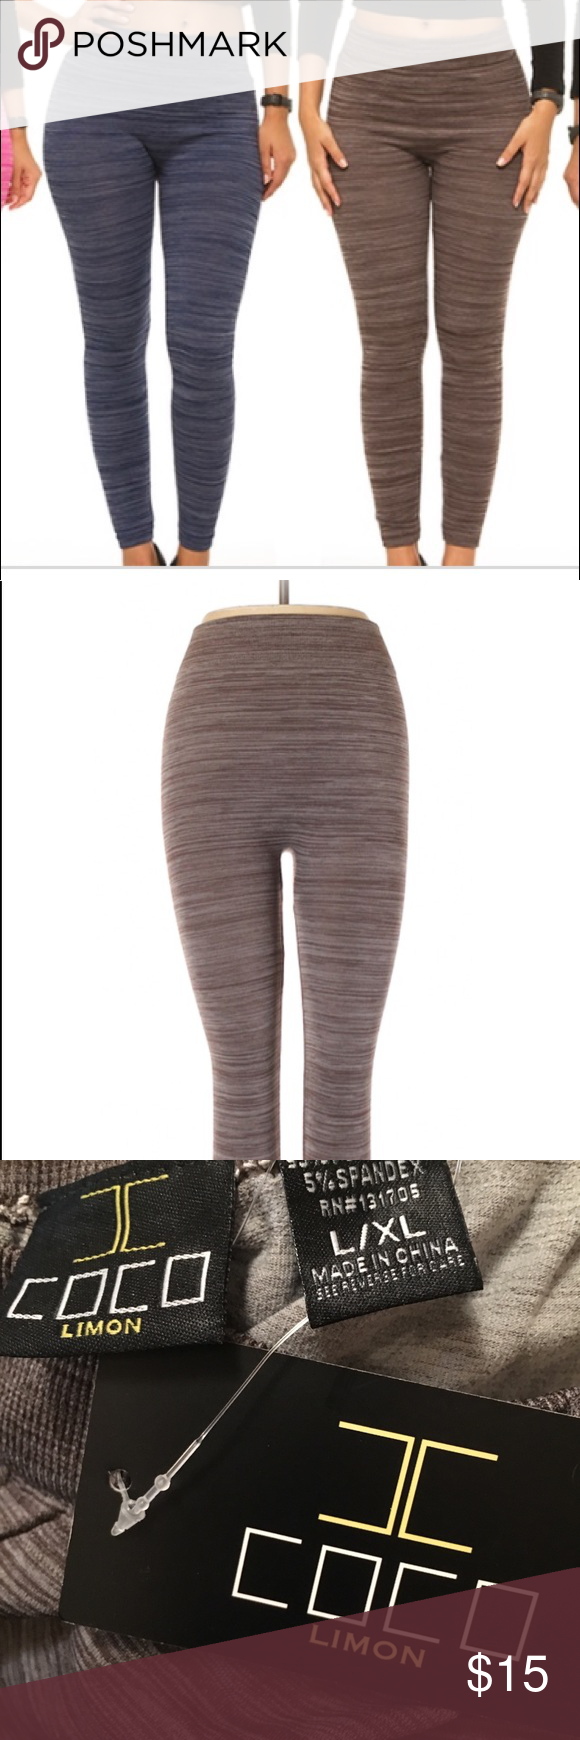 50ac843537 Coco Limon Women's L/XL grey leggings NWT Coco Limon Women's L/XL Space